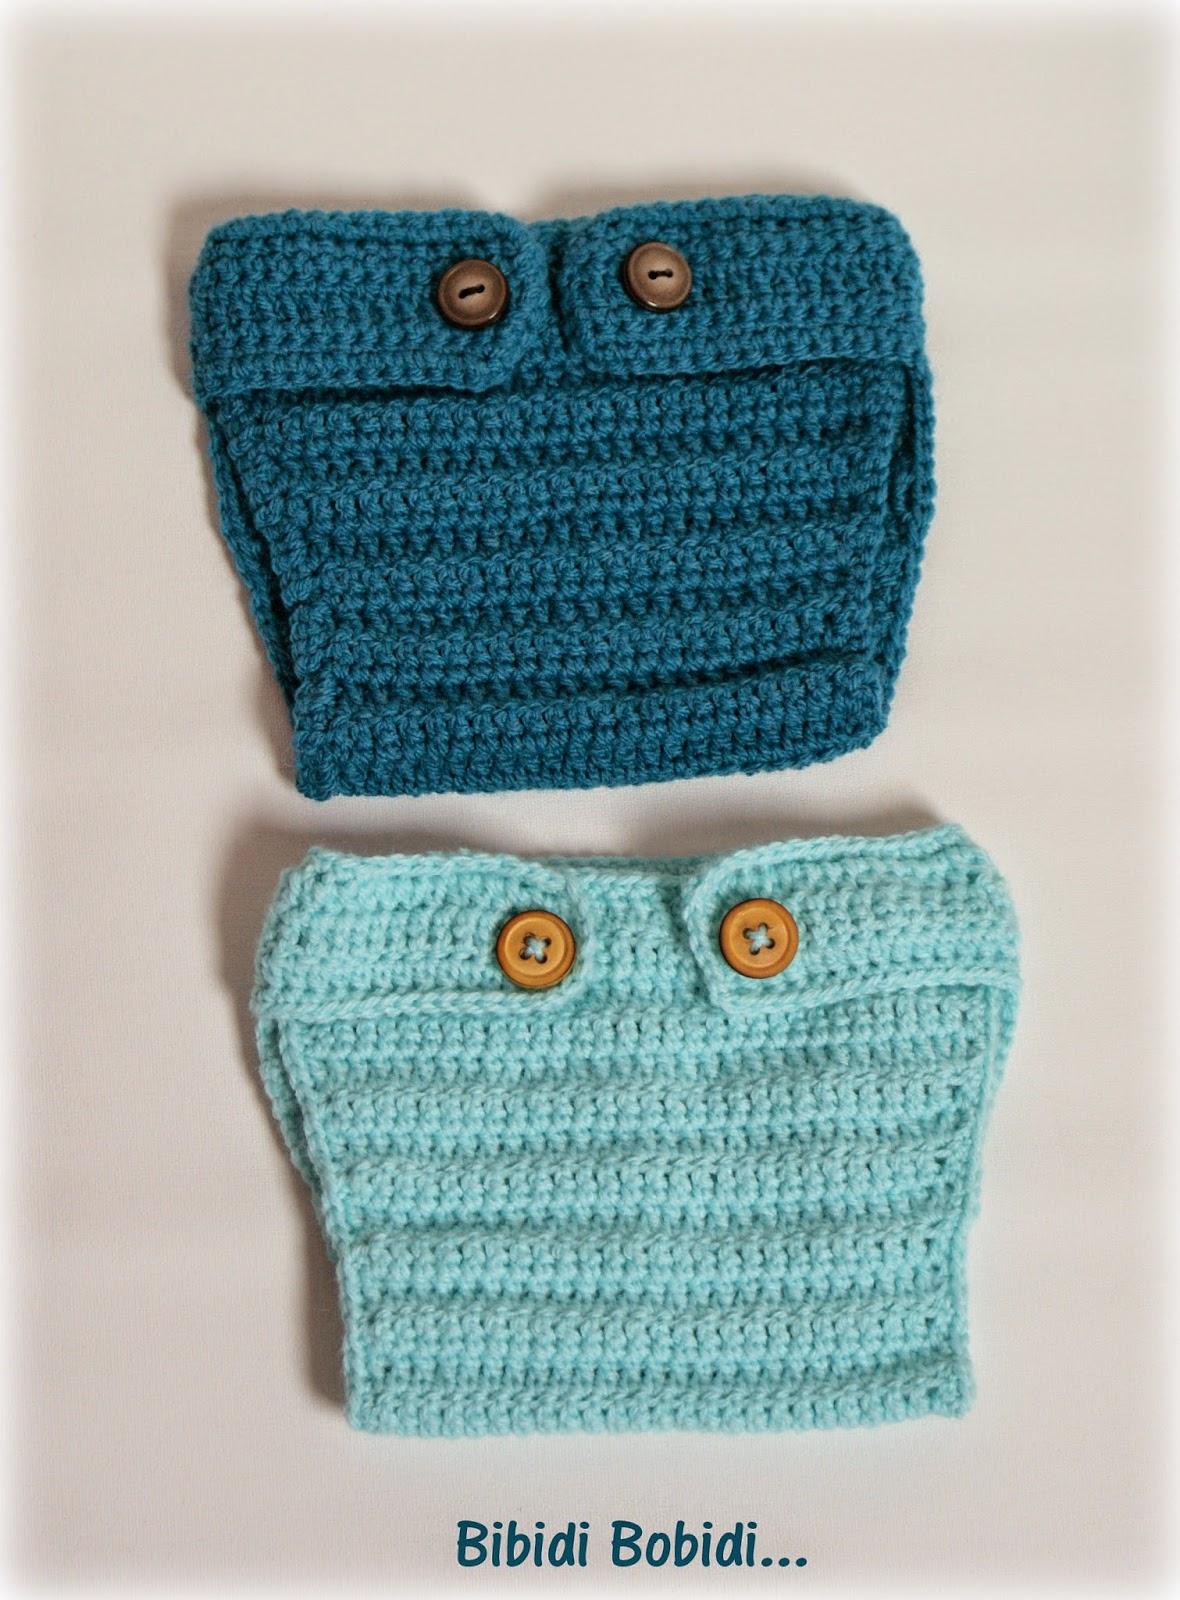 bibidi bobidi accessoires crochet le cache couche au crochet patron. Black Bedroom Furniture Sets. Home Design Ideas